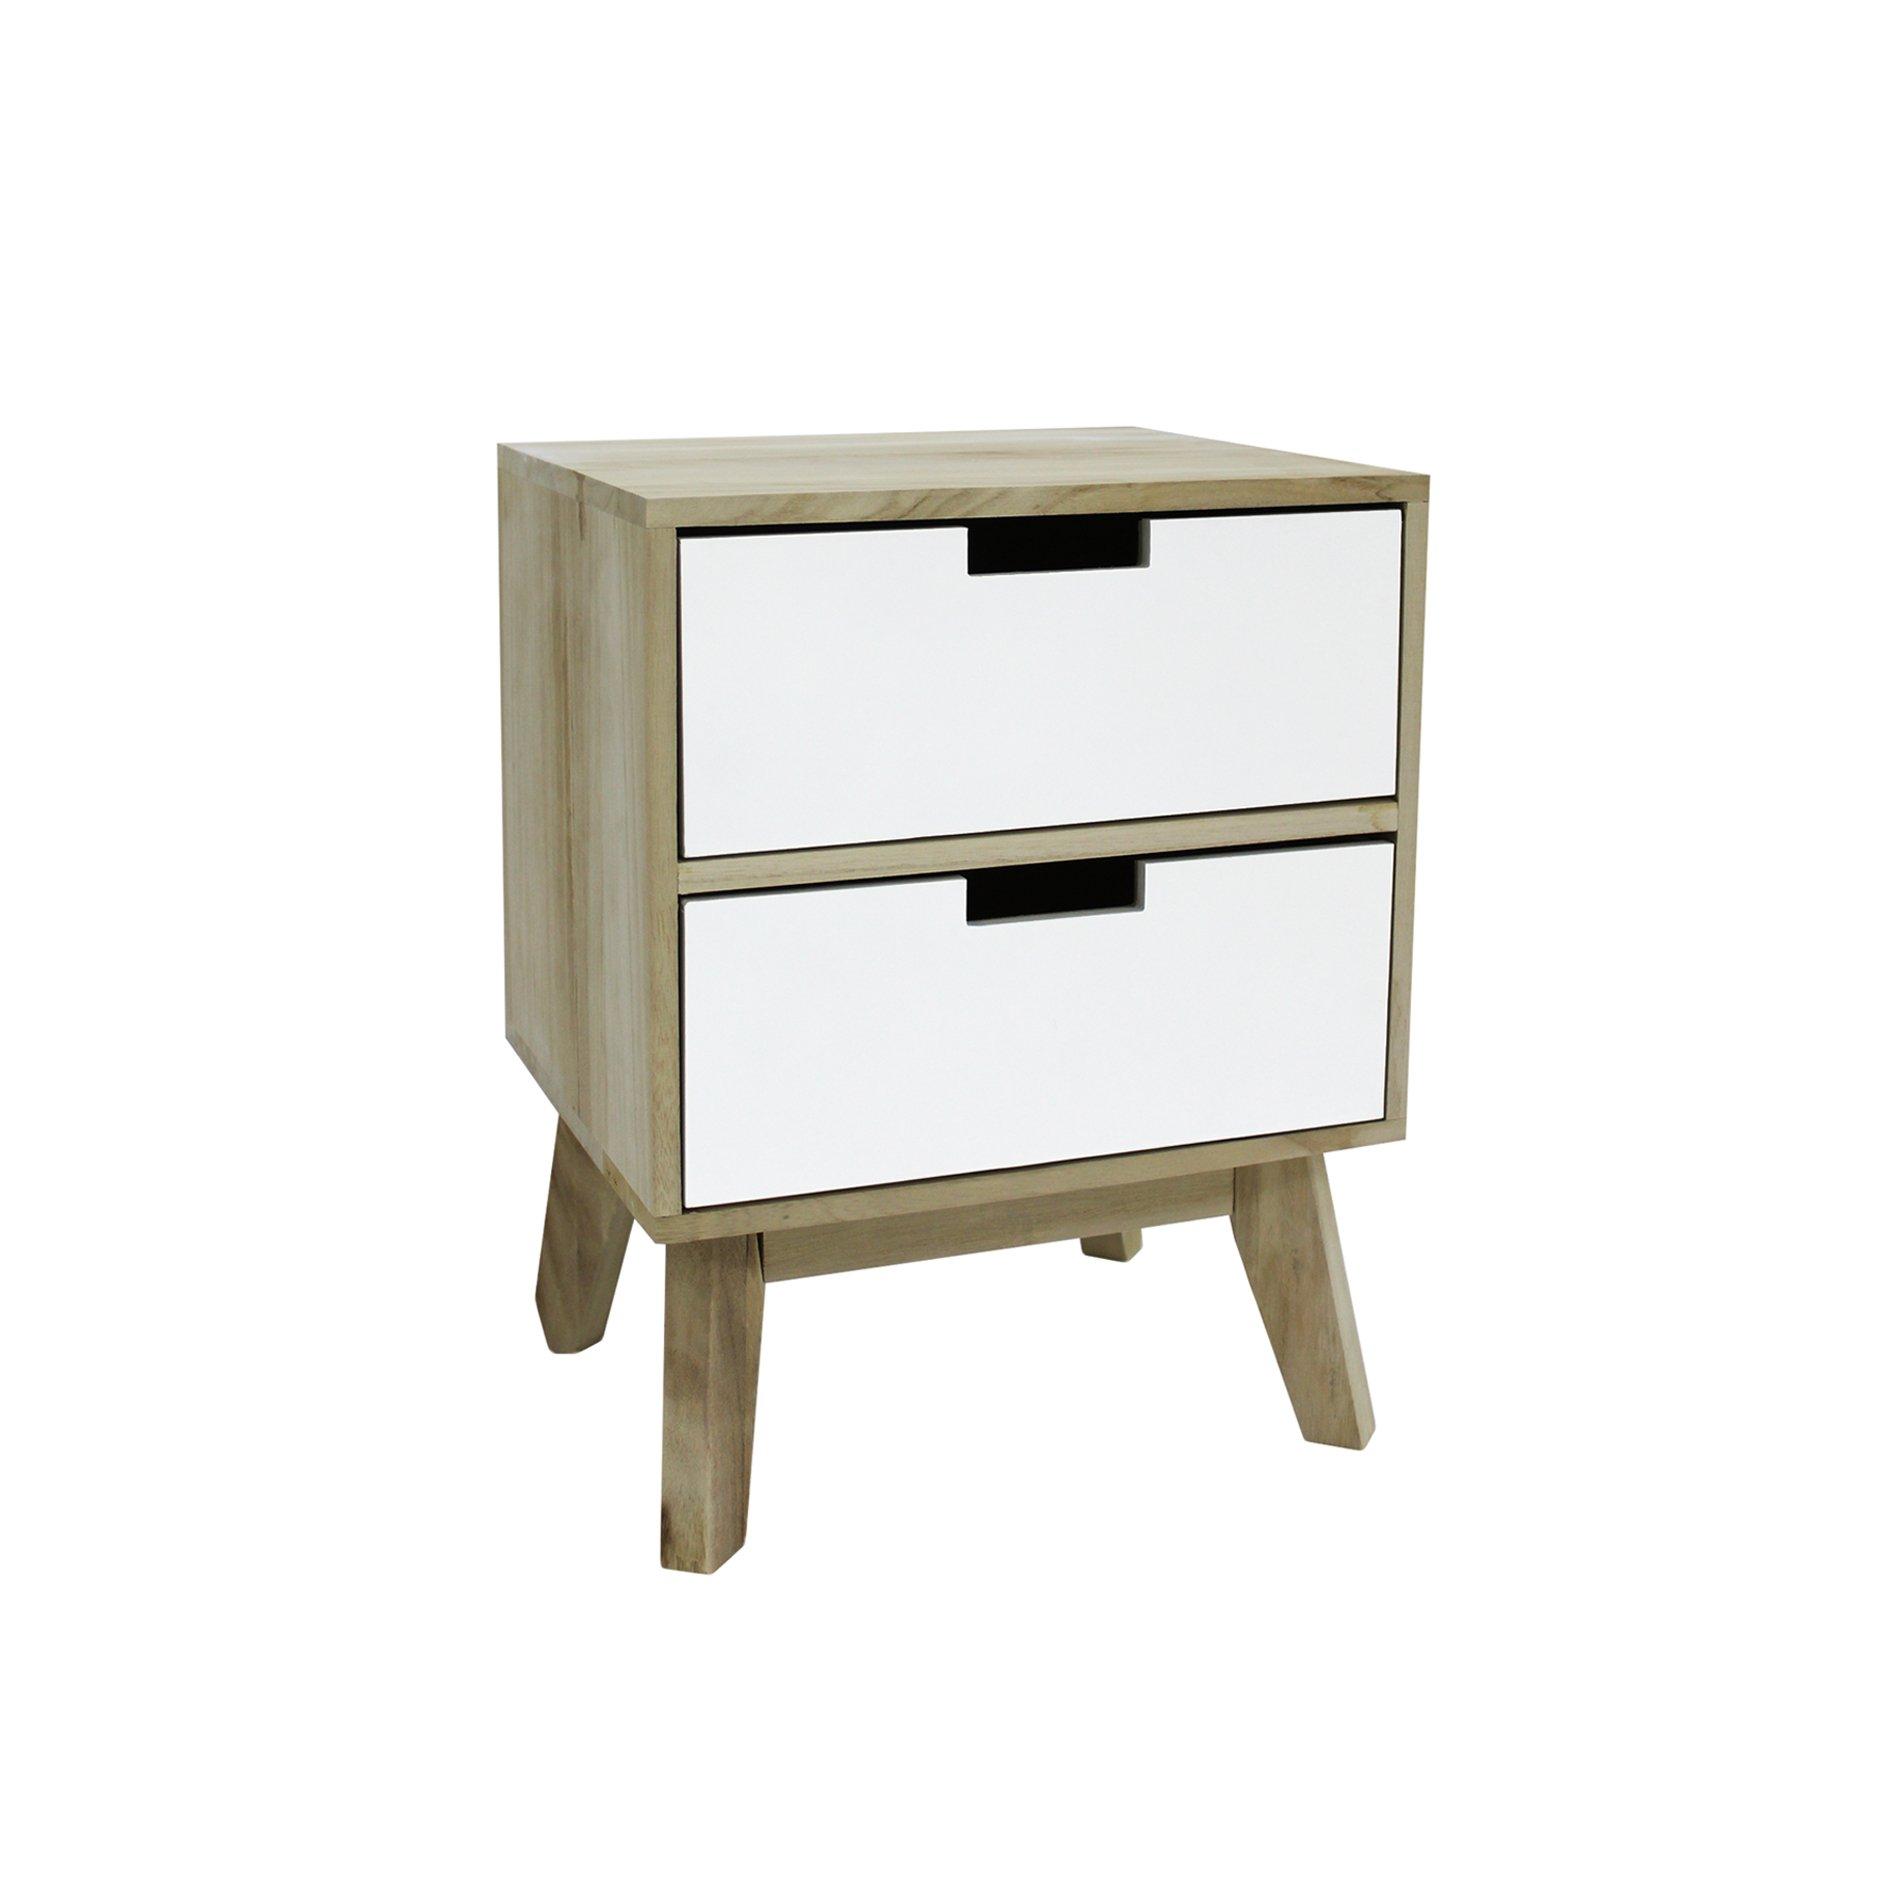 rebecca mobili armoire commode blanc marron clair bois decor scandinave chambre salon inspid co. Black Bedroom Furniture Sets. Home Design Ideas